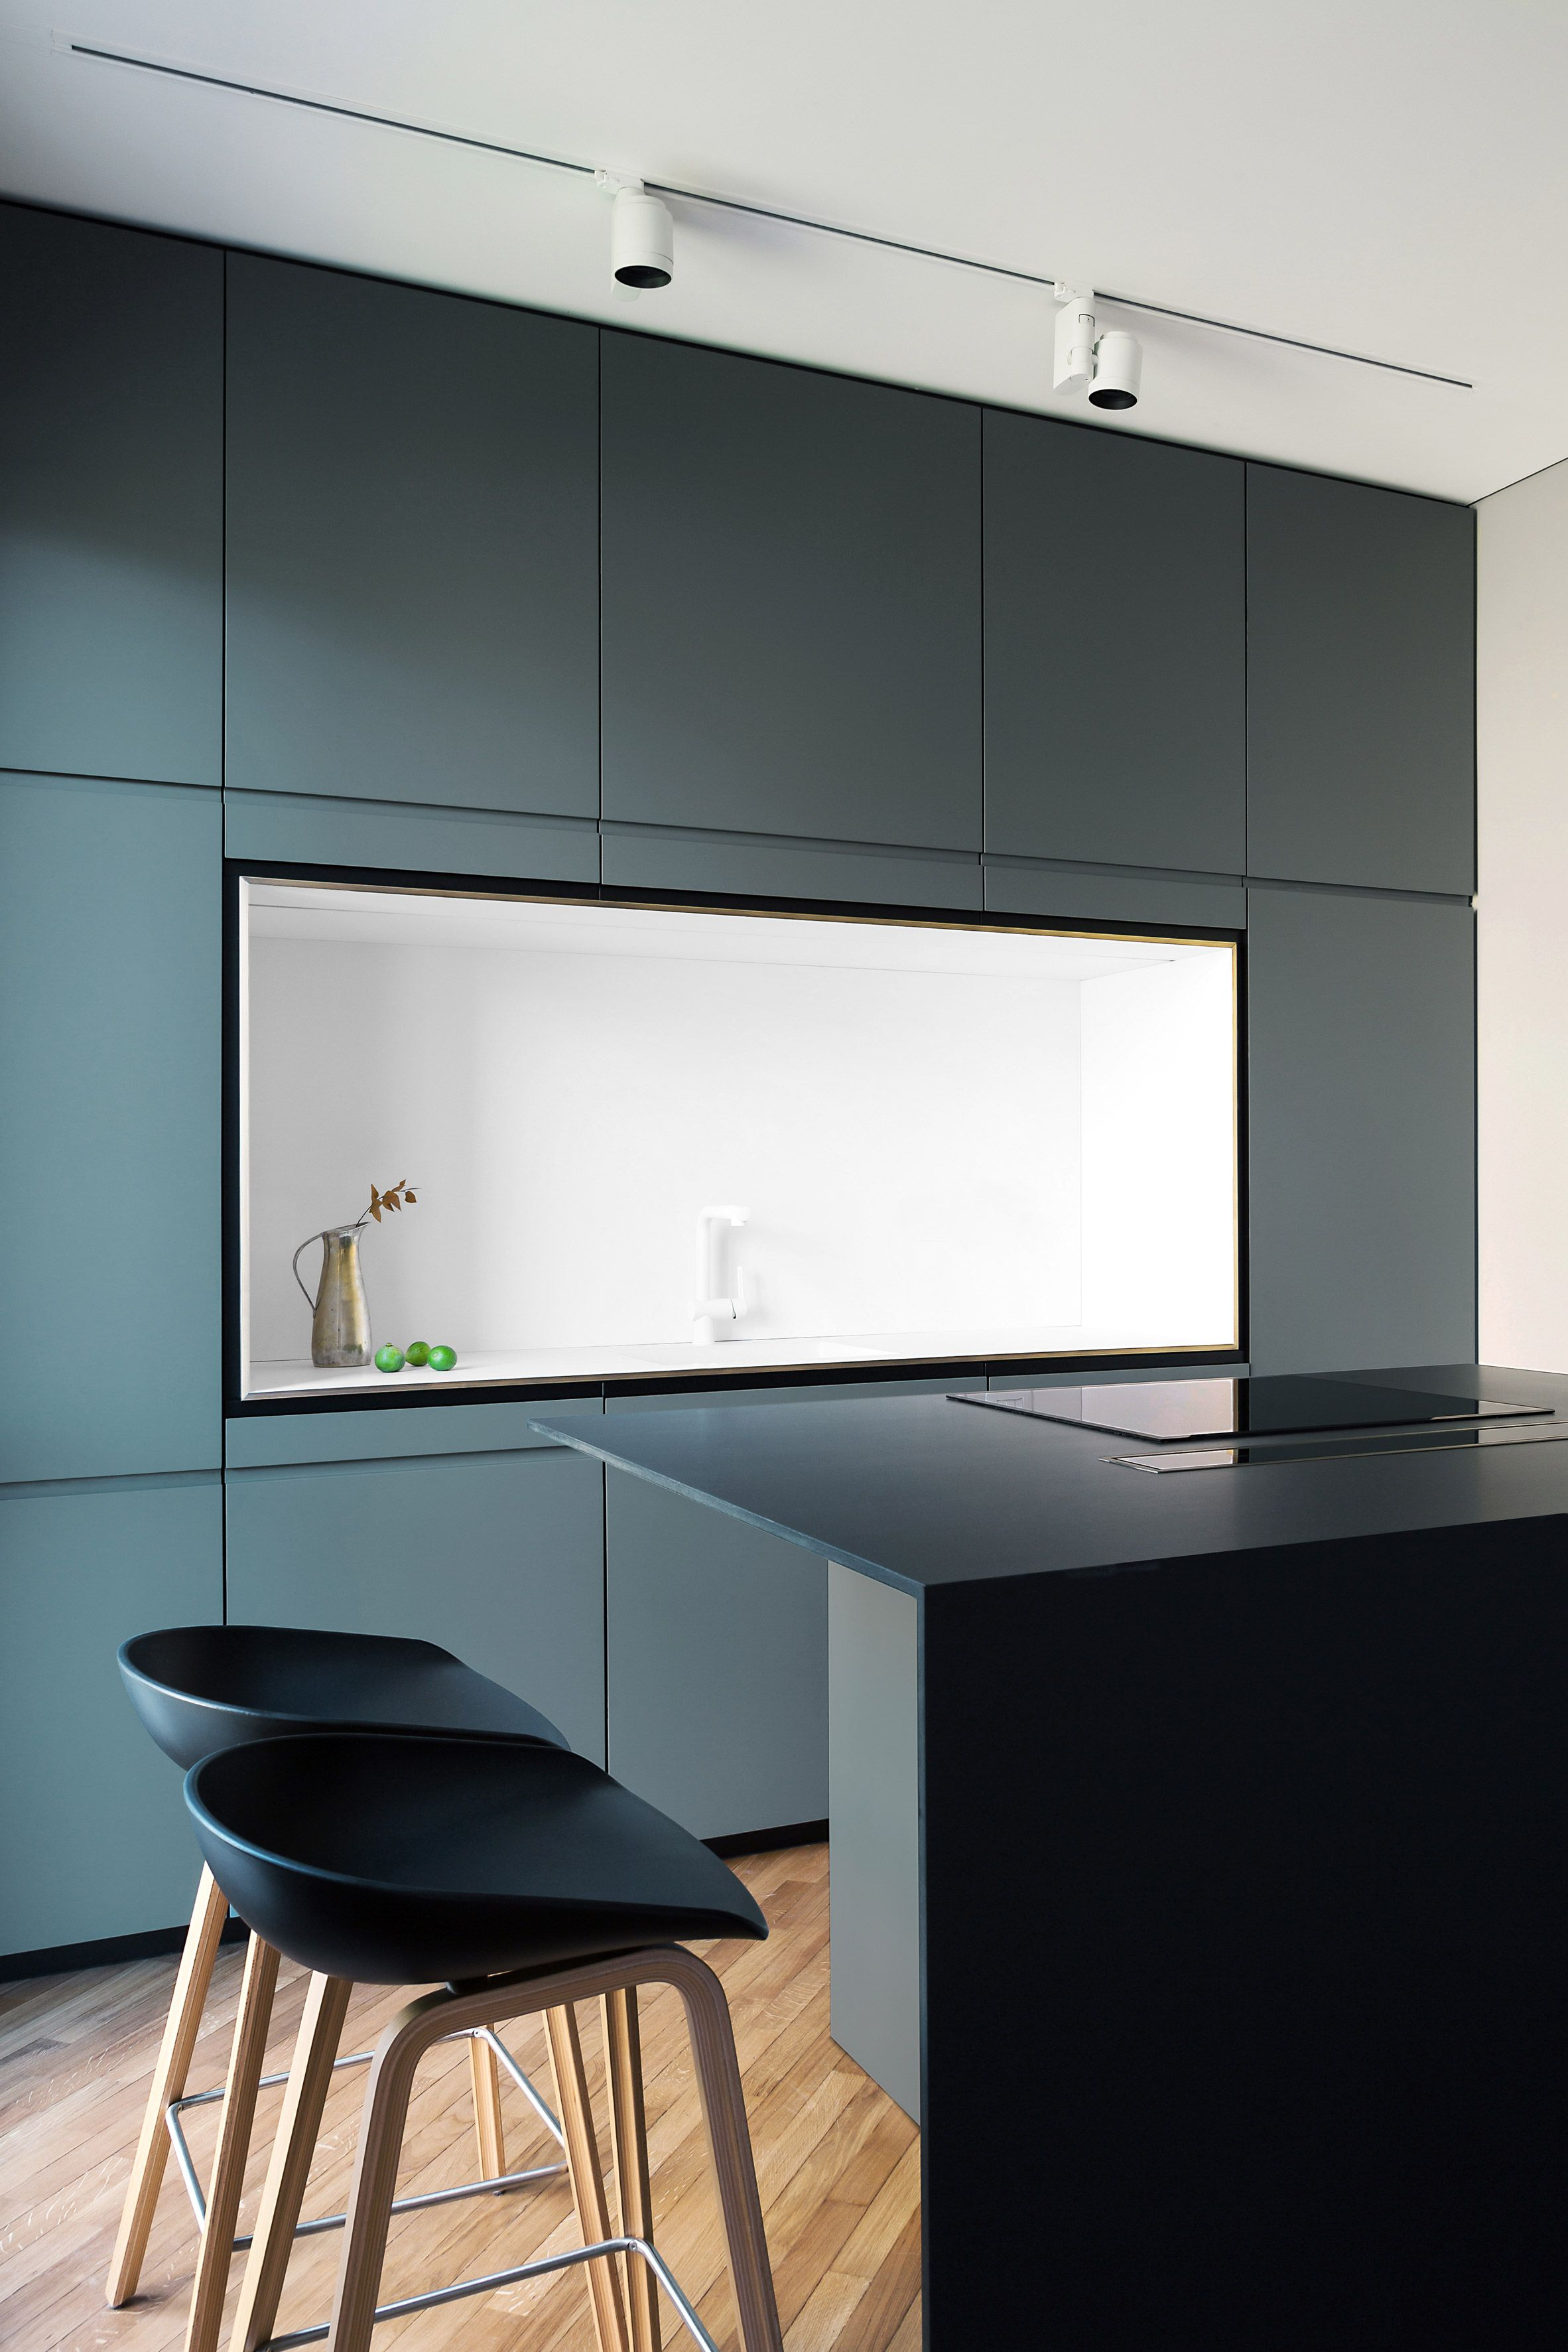 Italian design studio AIM has renovated the interior of a home in ...